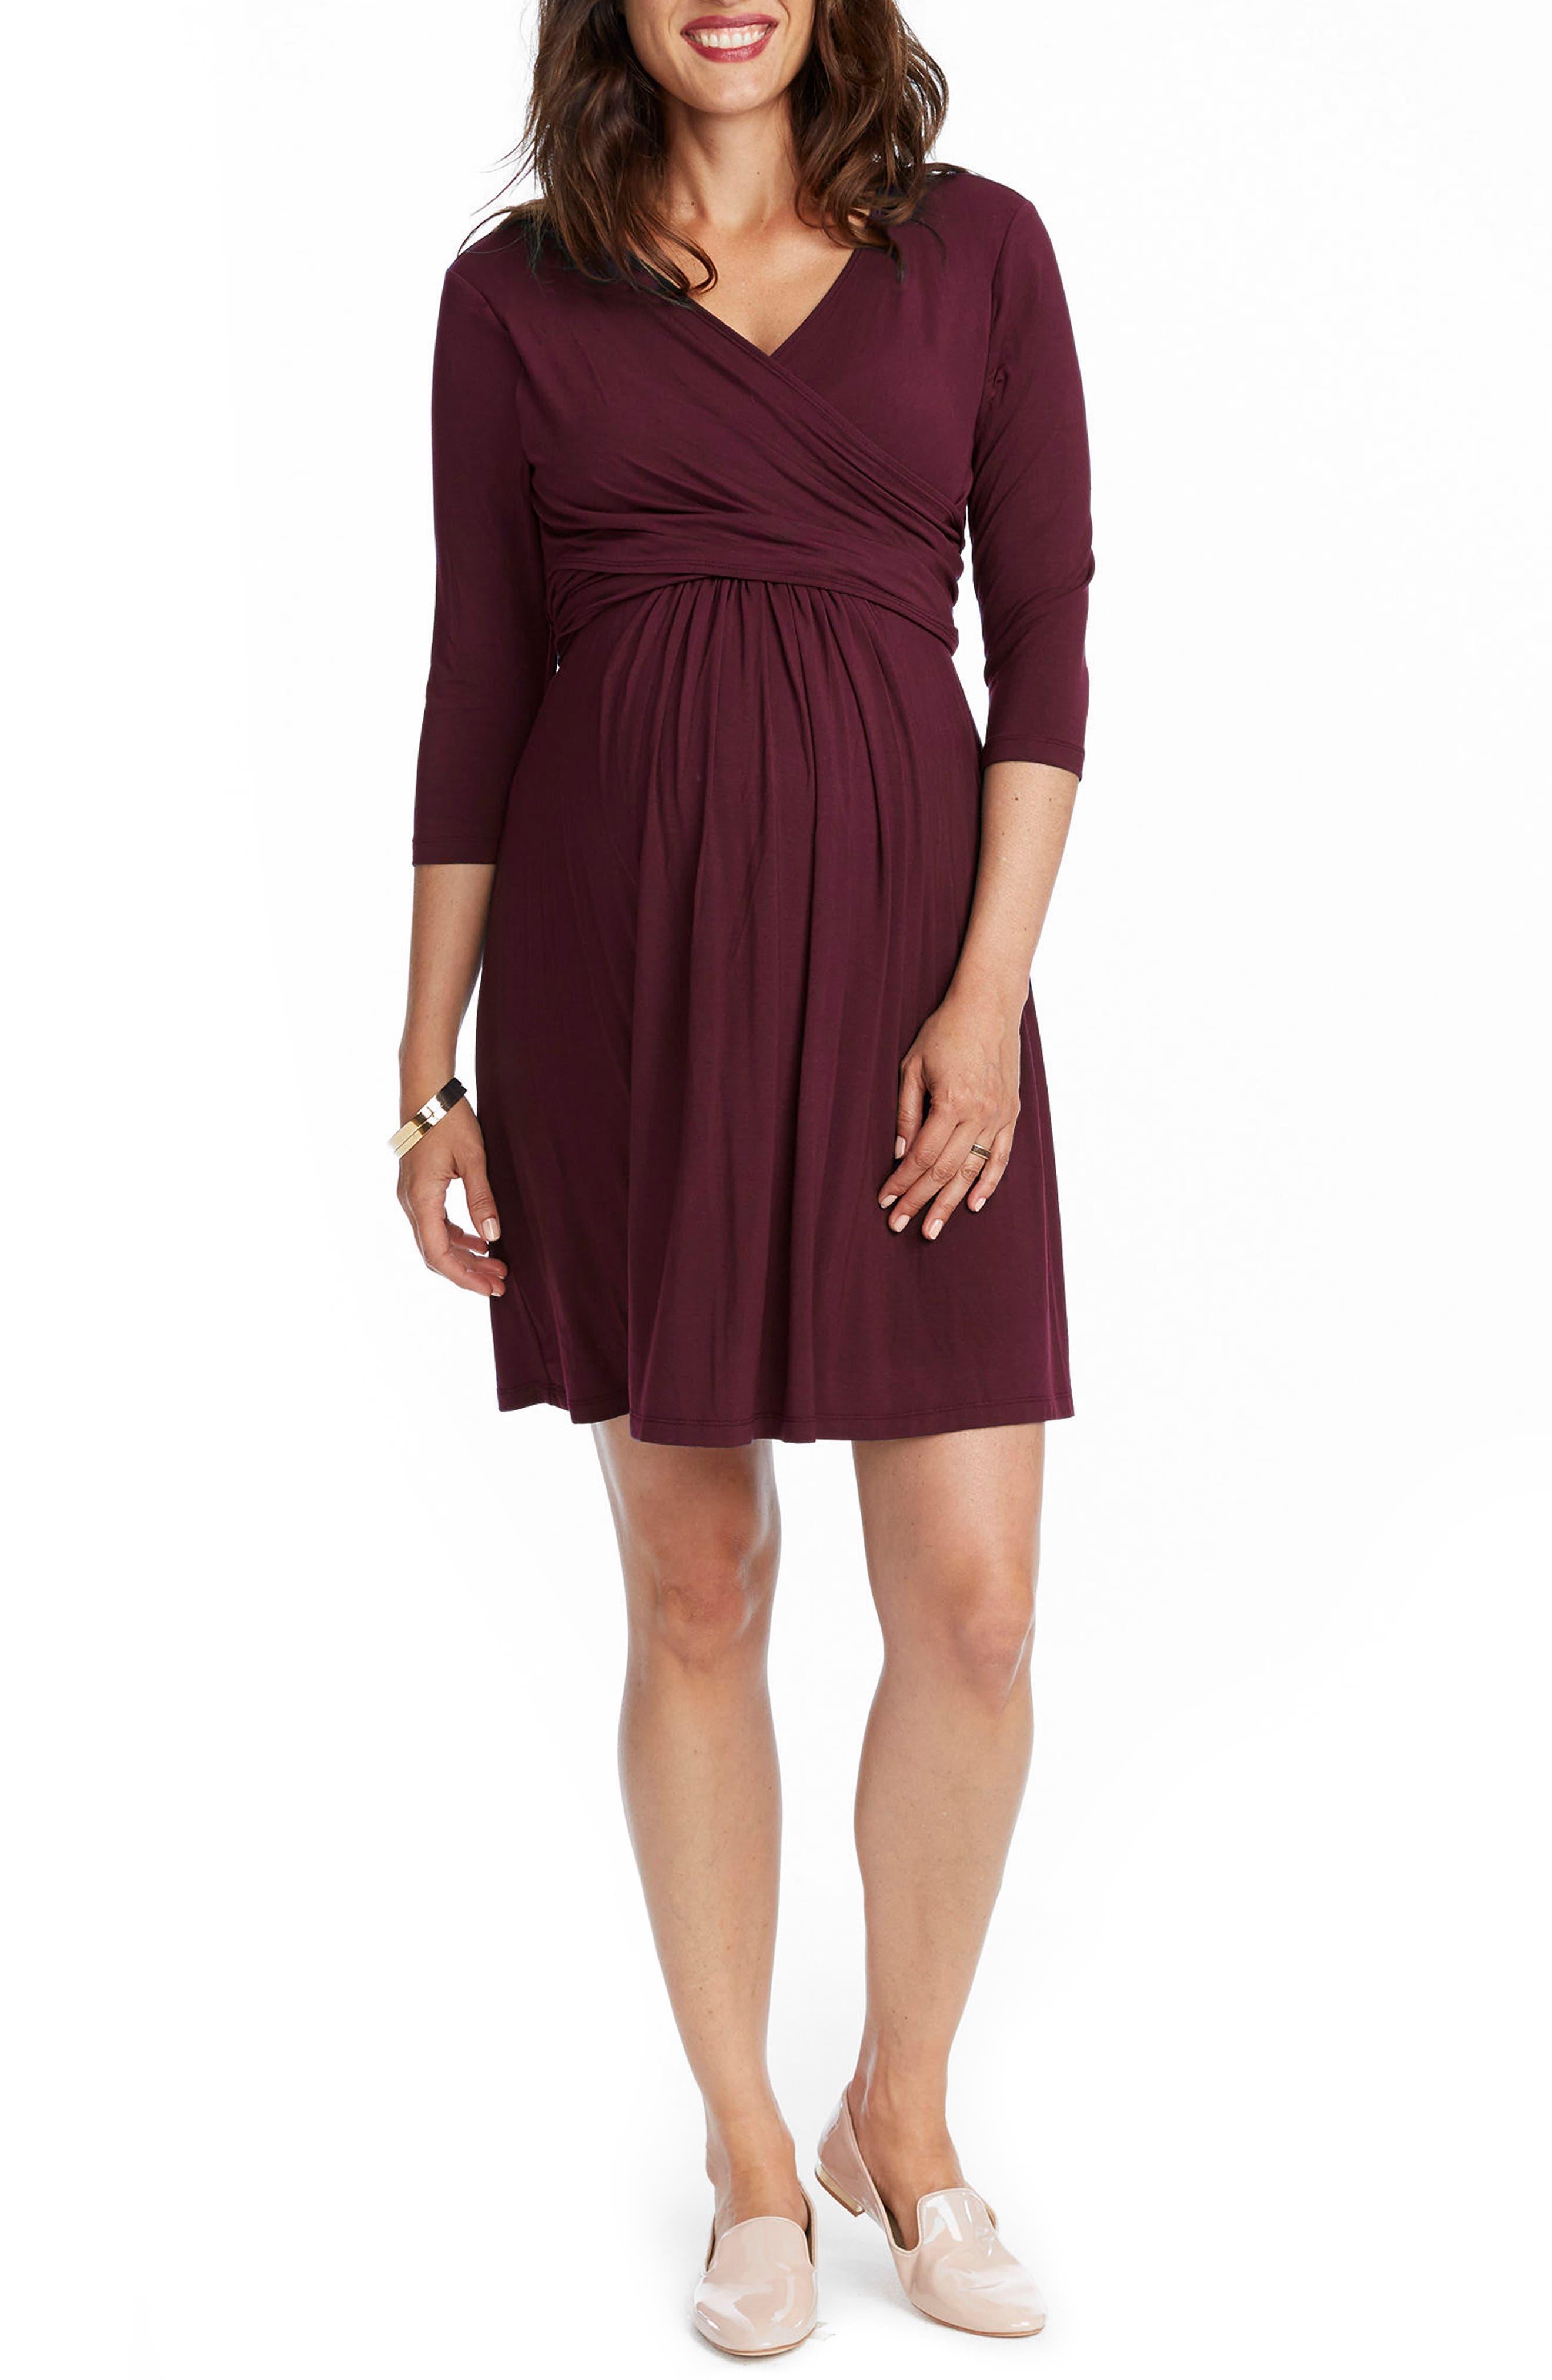 Rosie Pope Maternity/Nursing Wrap Dress